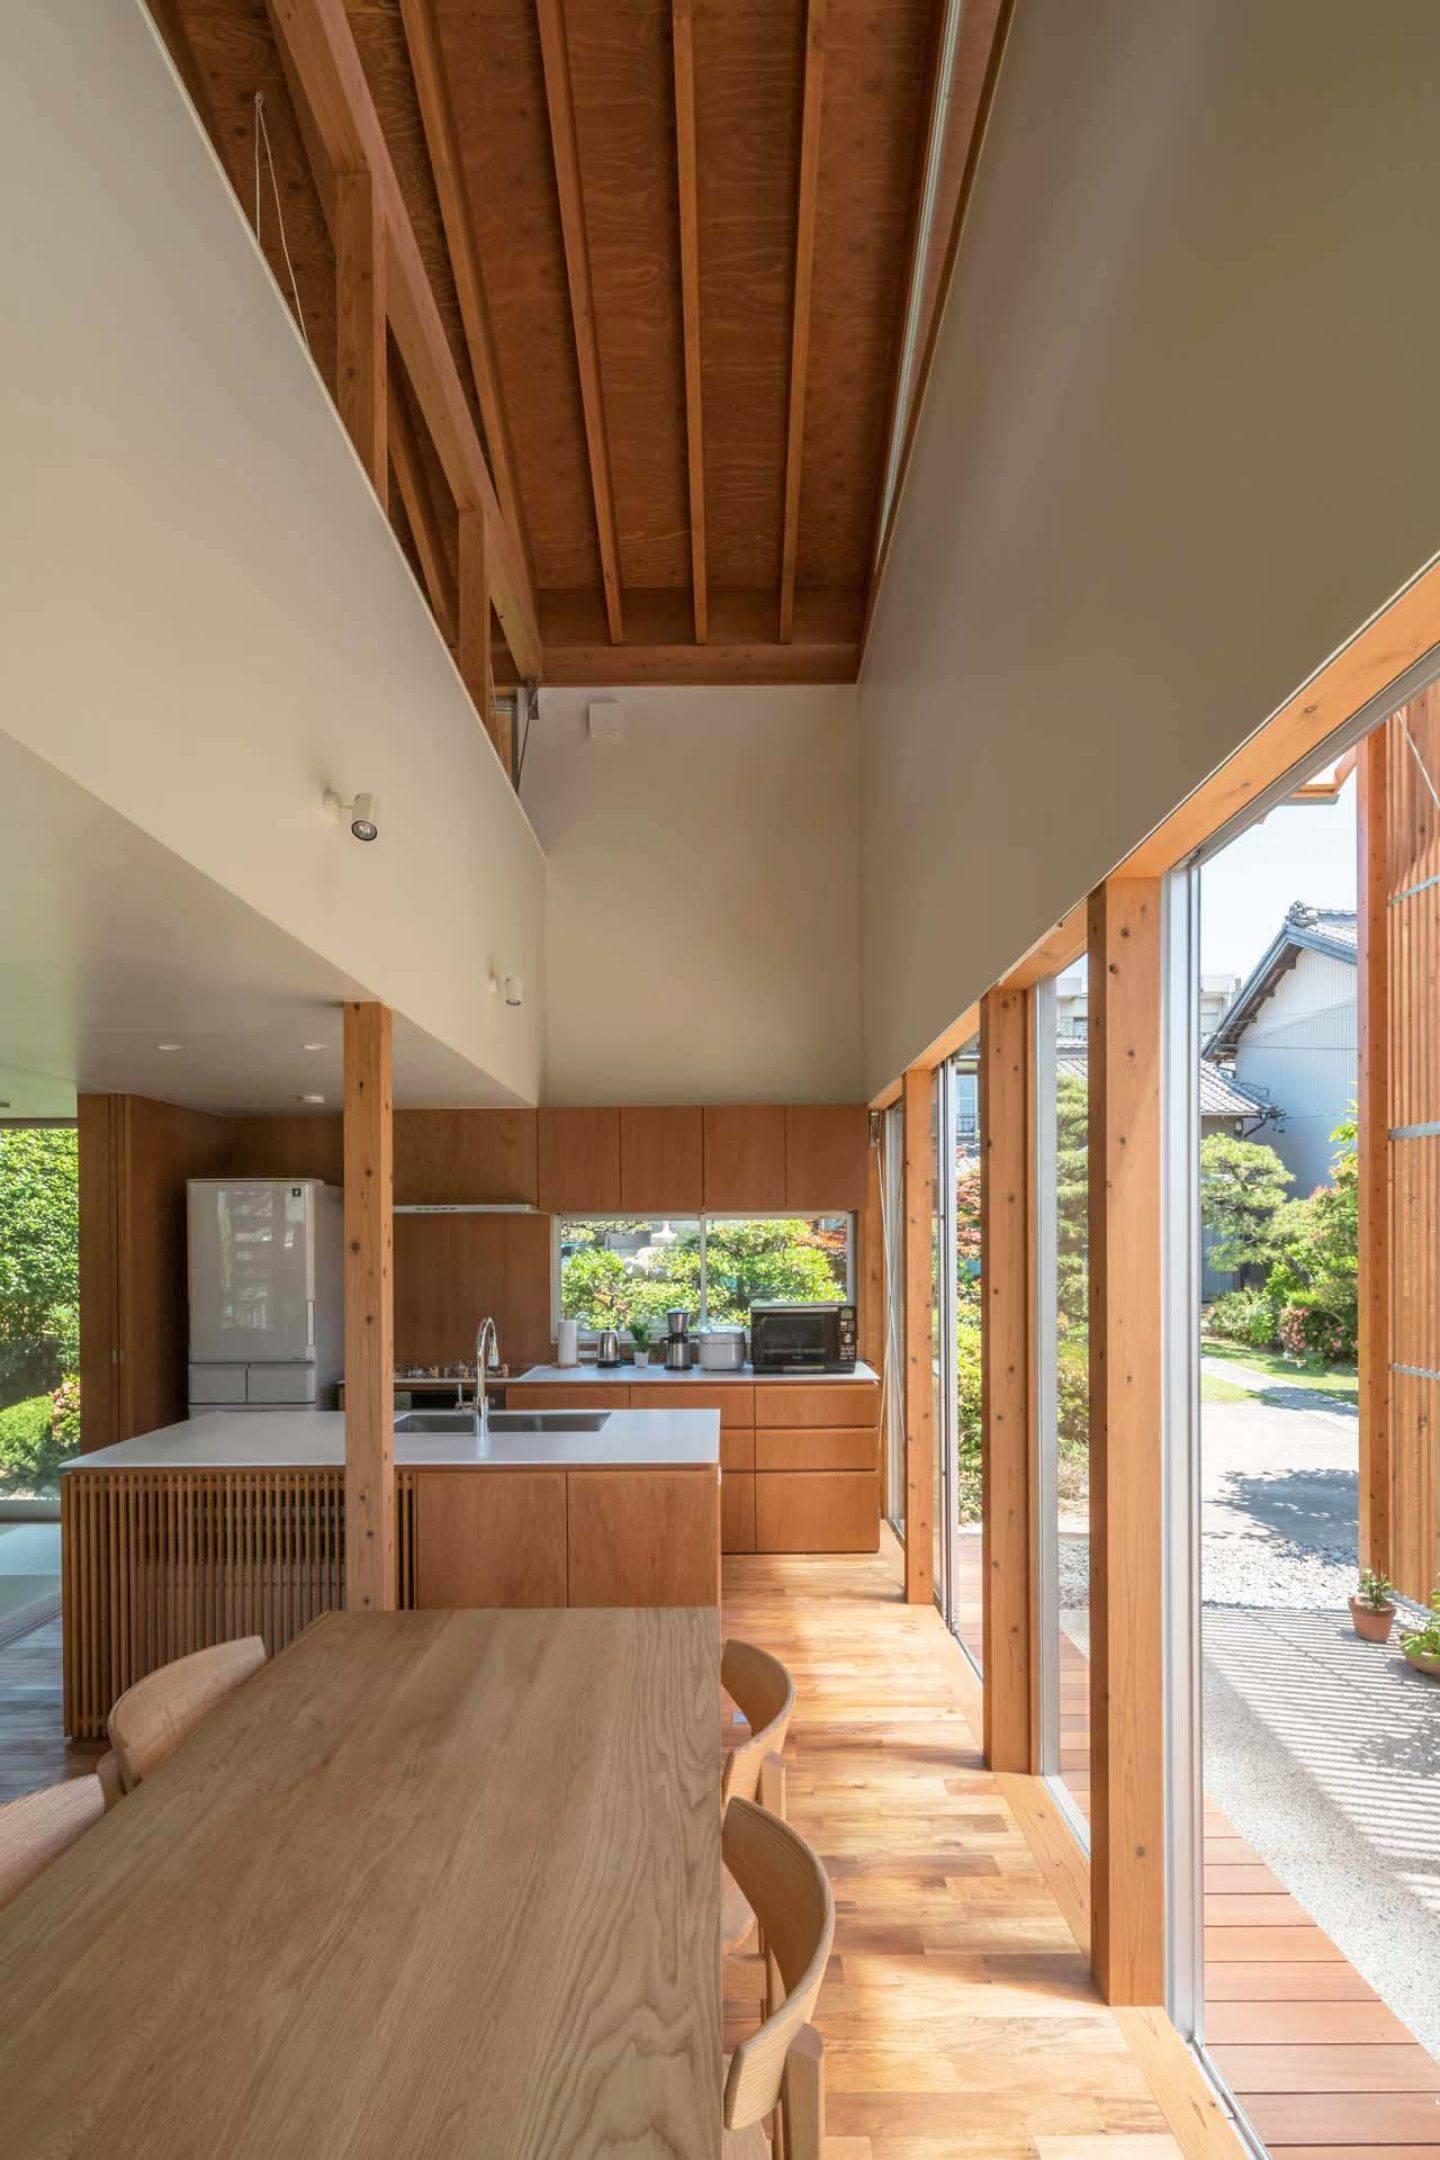 IGNANT-Architecture-Kota-Mizuishi-House-In-Otai-005